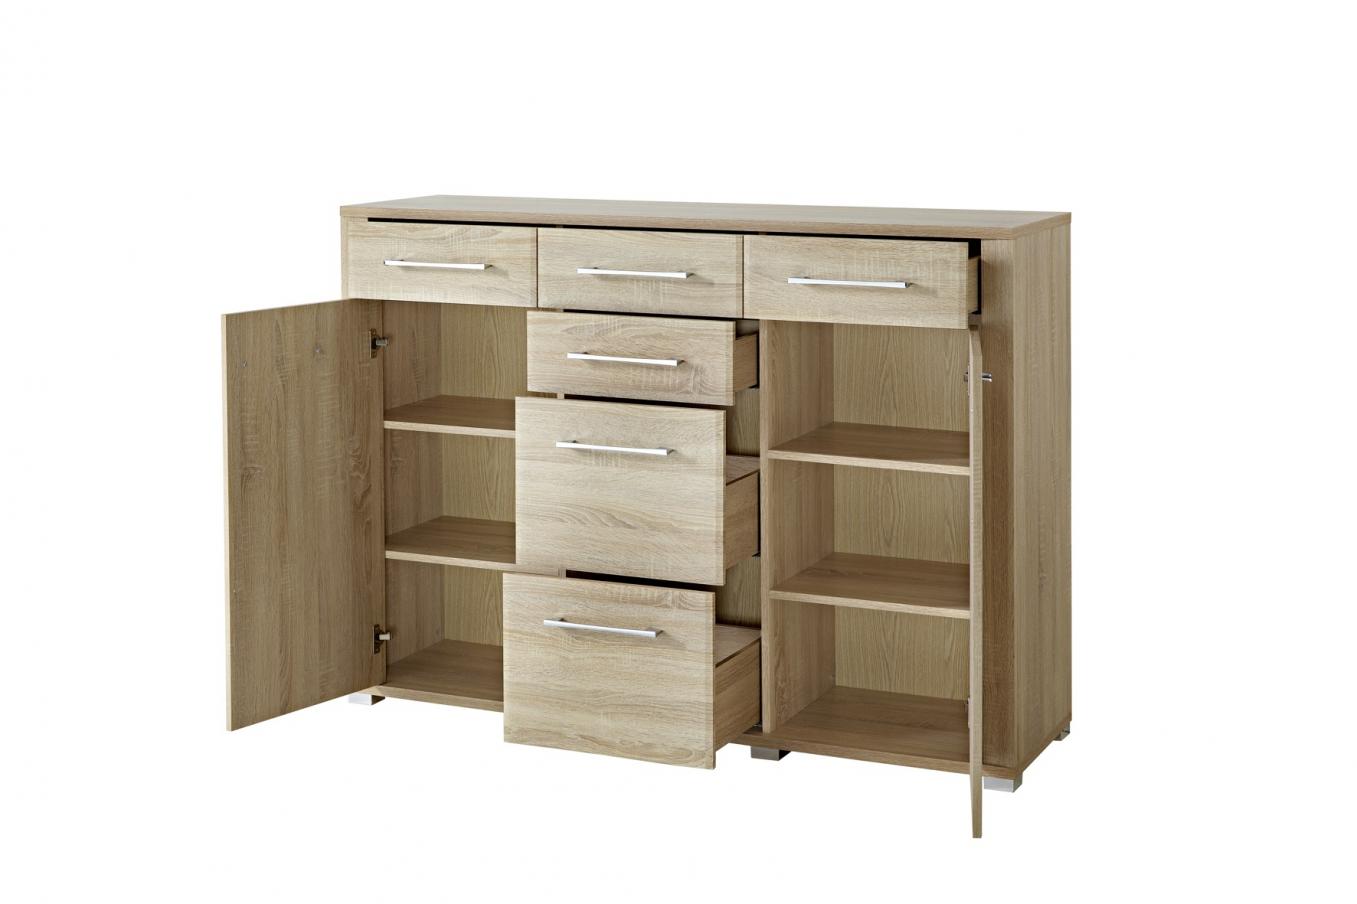 kommode eiche sgerau great kommode eiche sgerau hochglanz. Black Bedroom Furniture Sets. Home Design Ideas